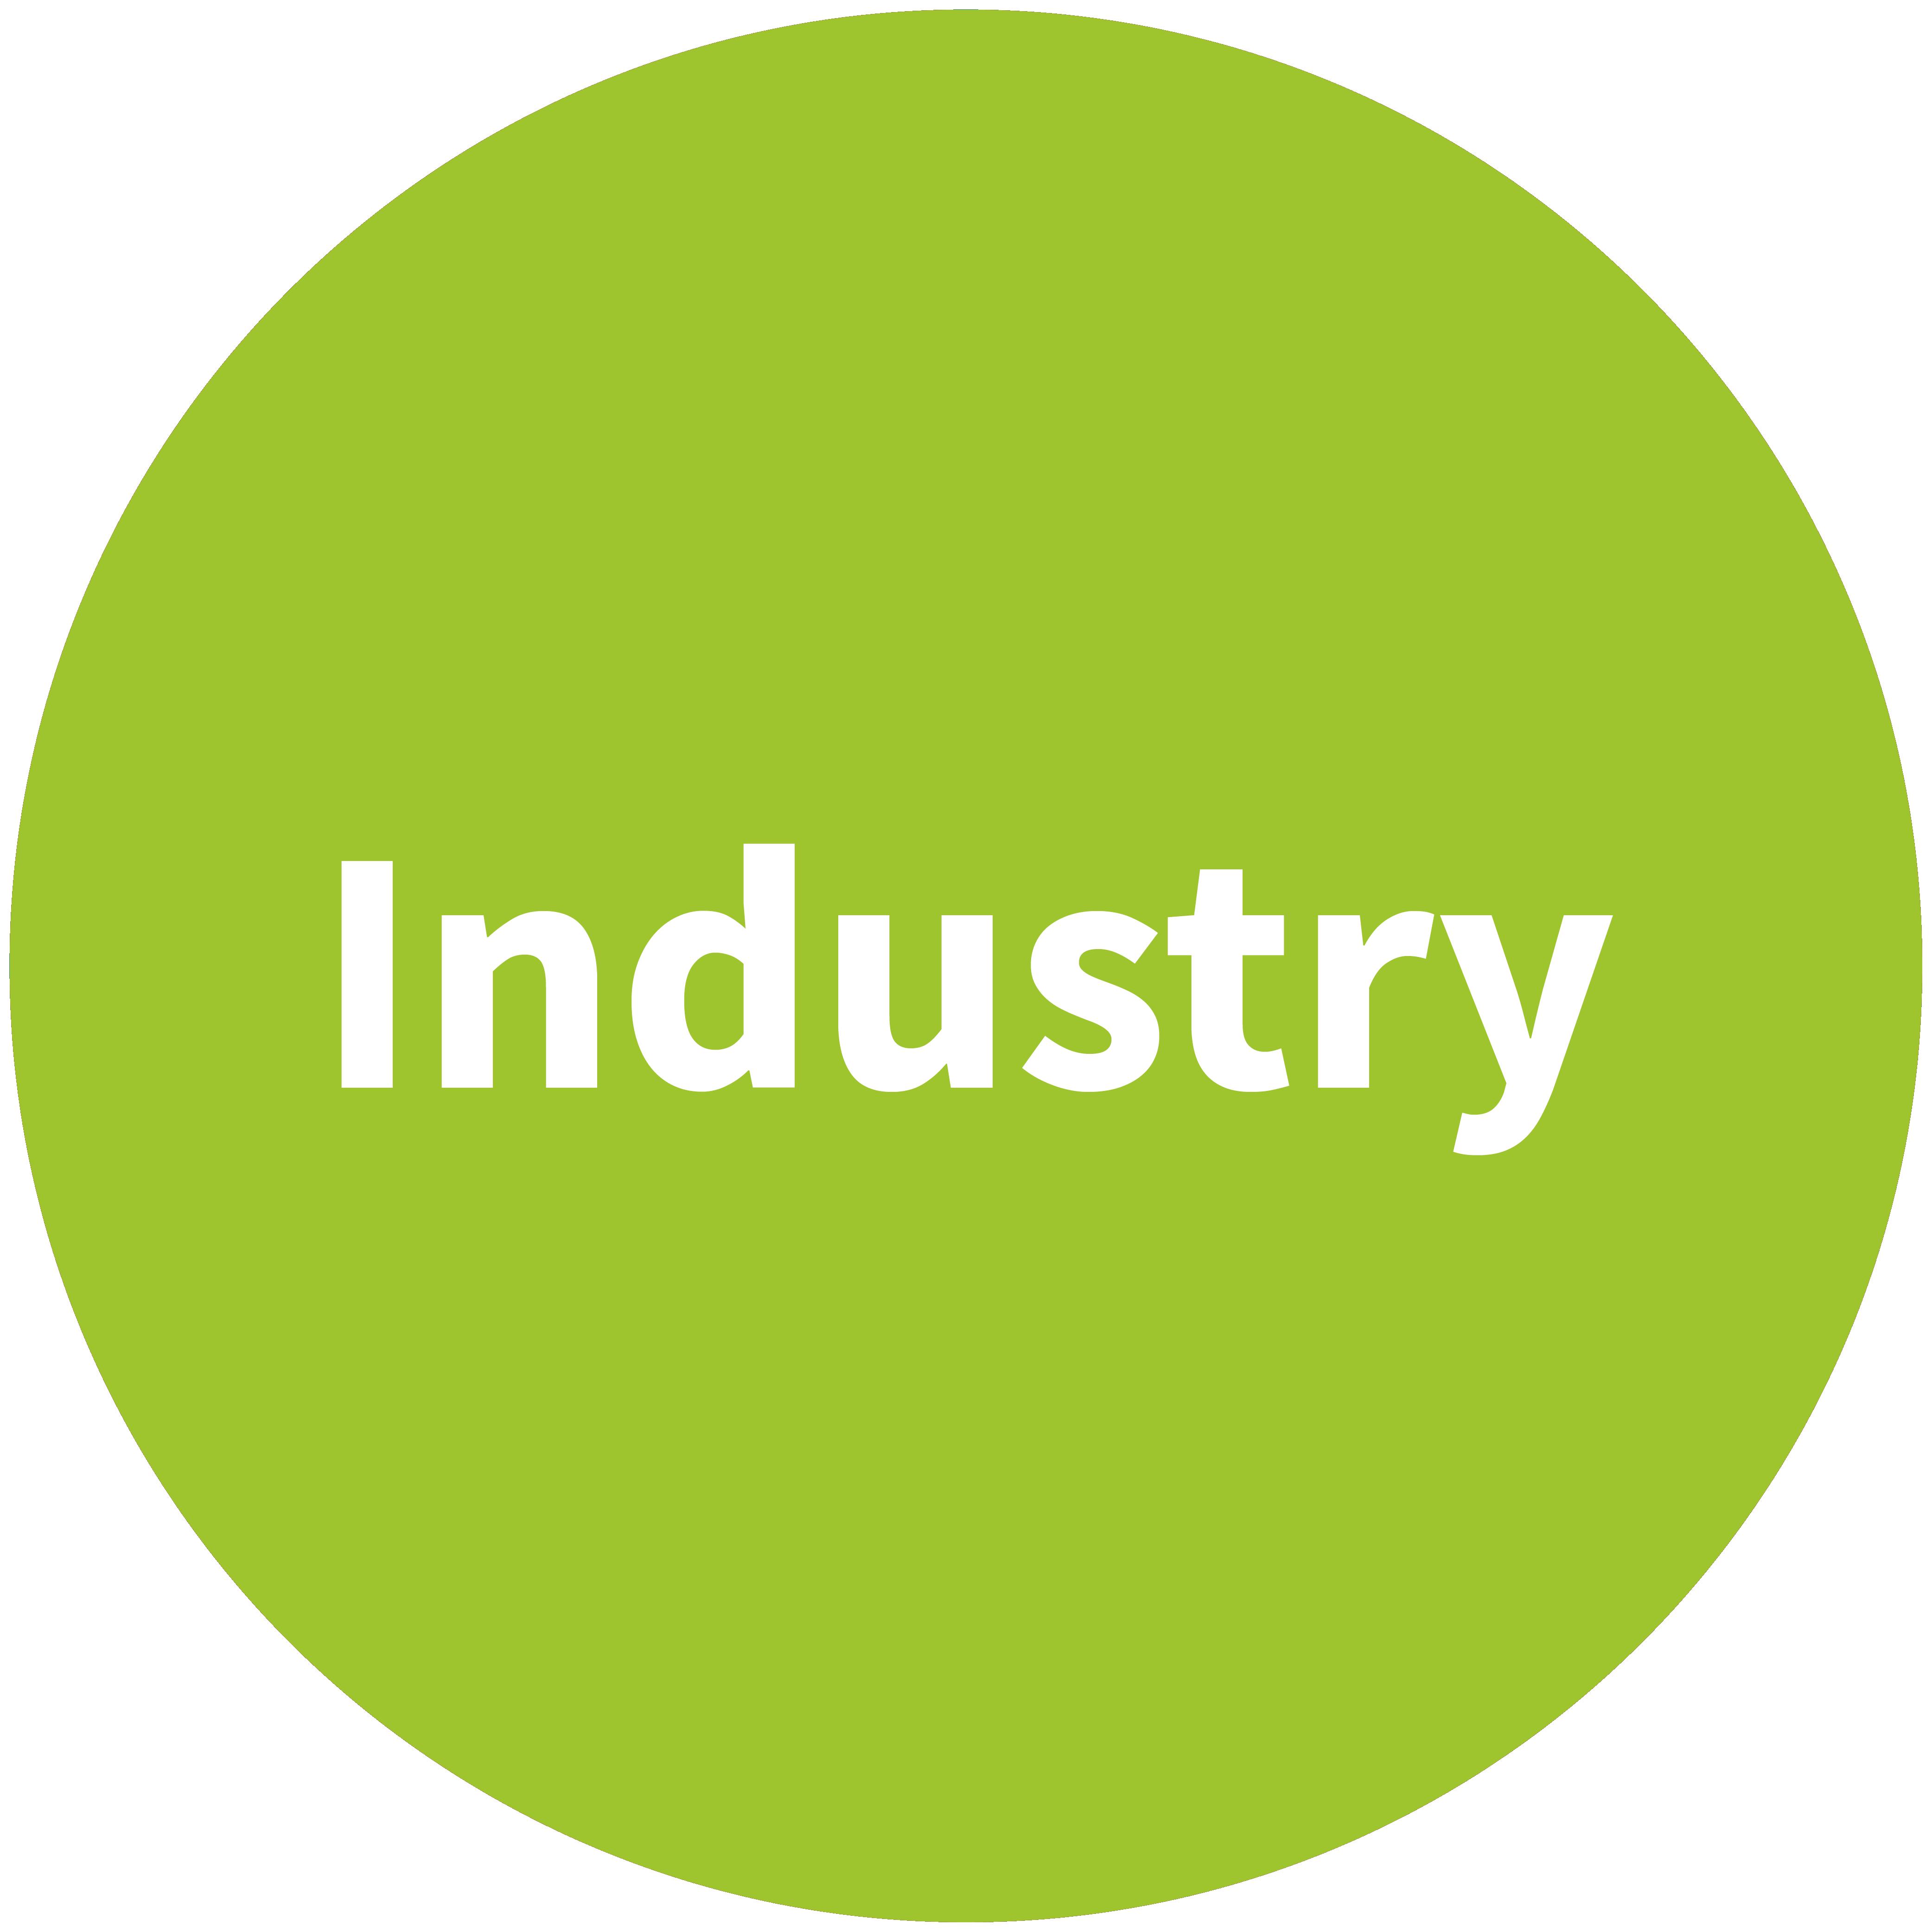 Visit the Brunata.One industry webpage